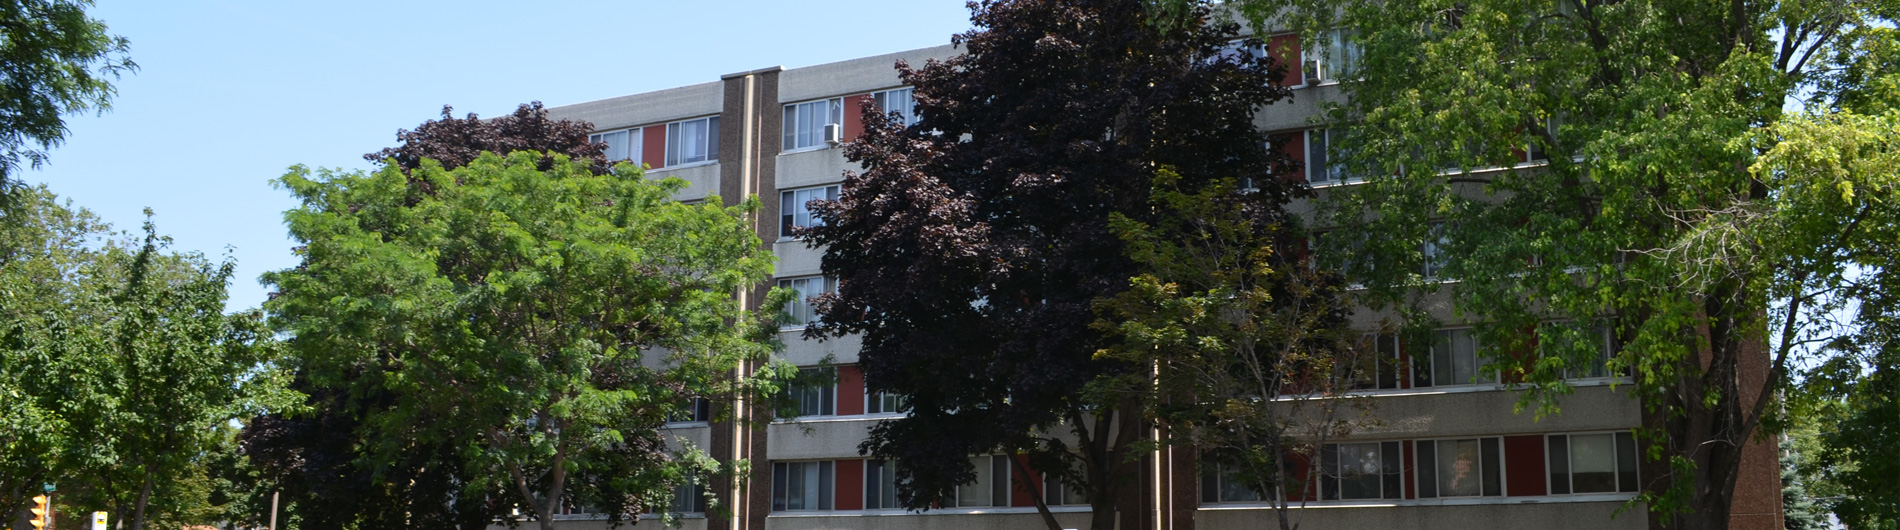 Boulevard Apartments